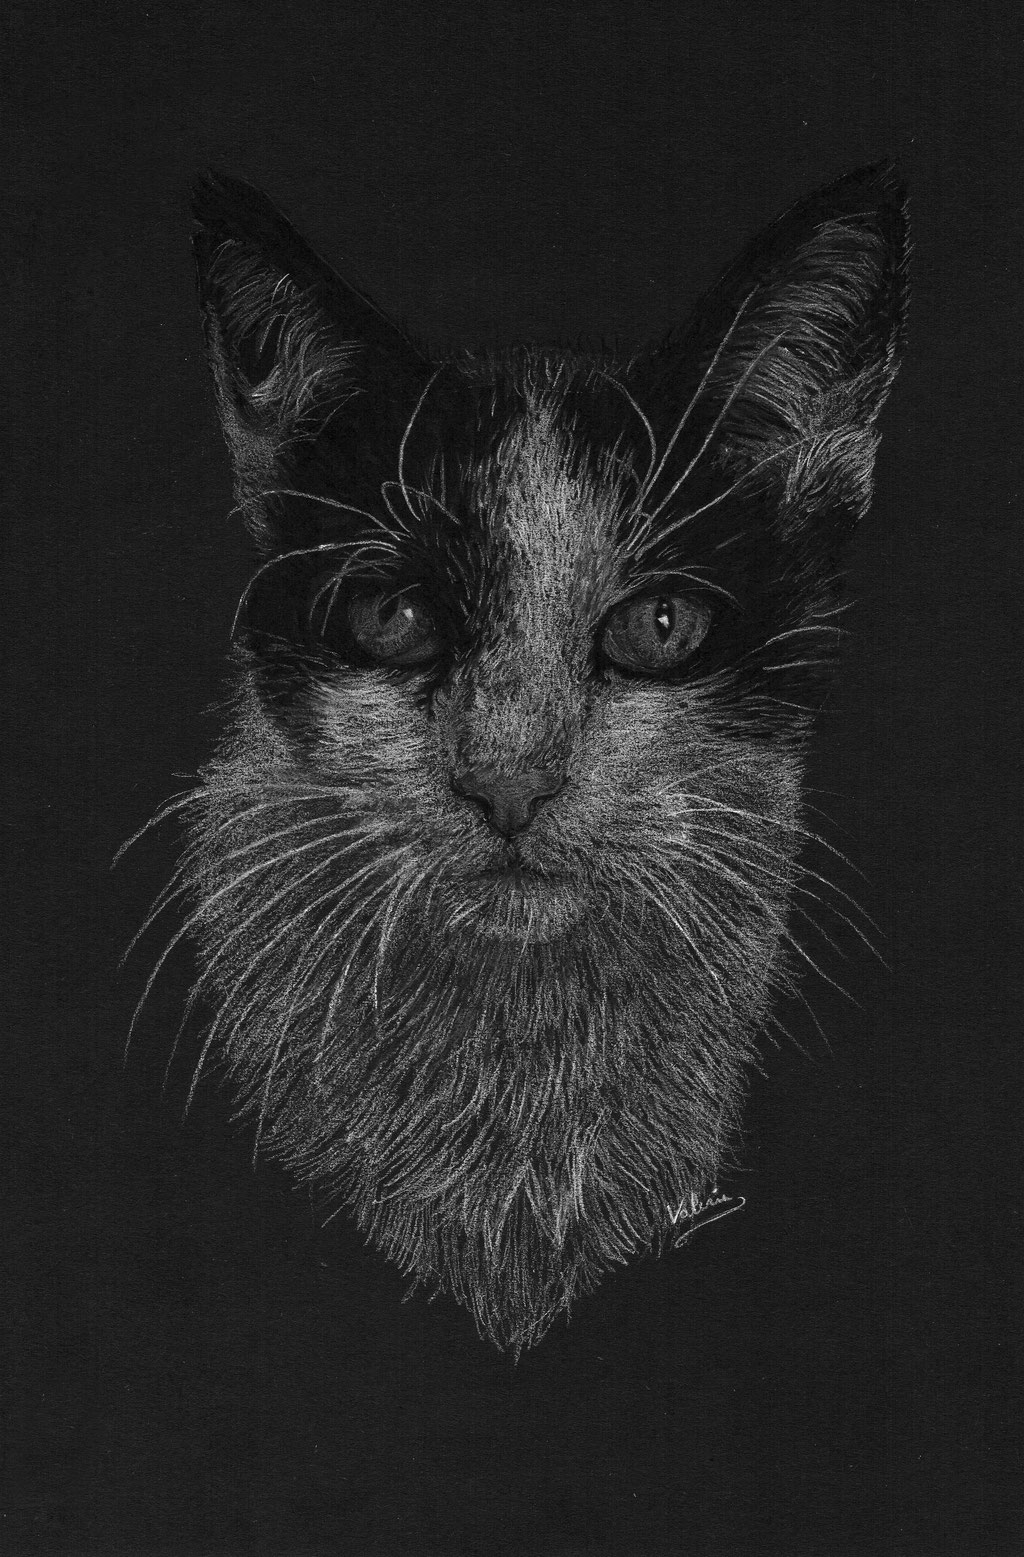 Dierenportret zwart-witte kat: Wit potlood op zwart papier (2017)